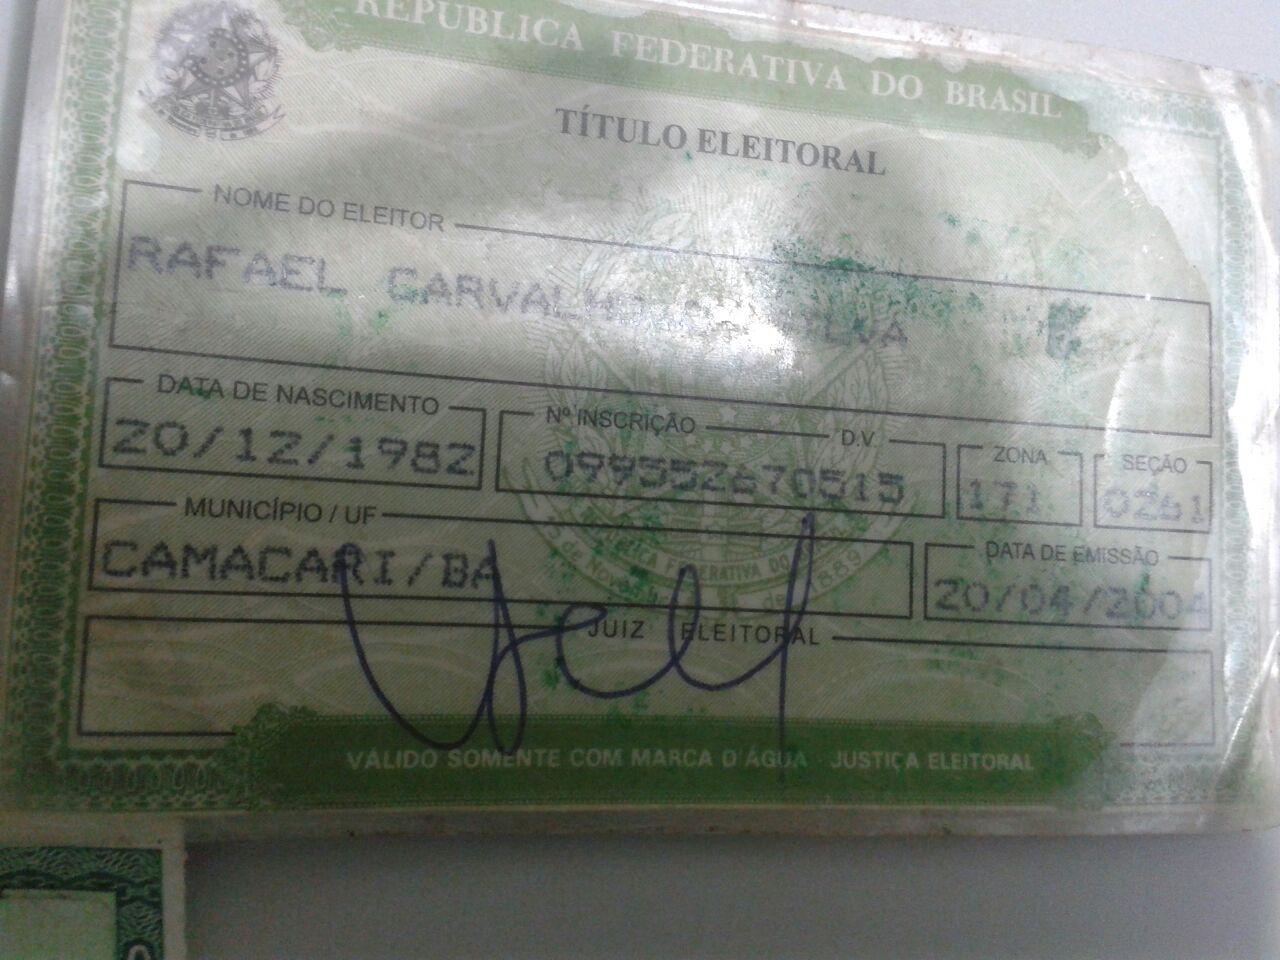 fabricio preso documento falso5jpg